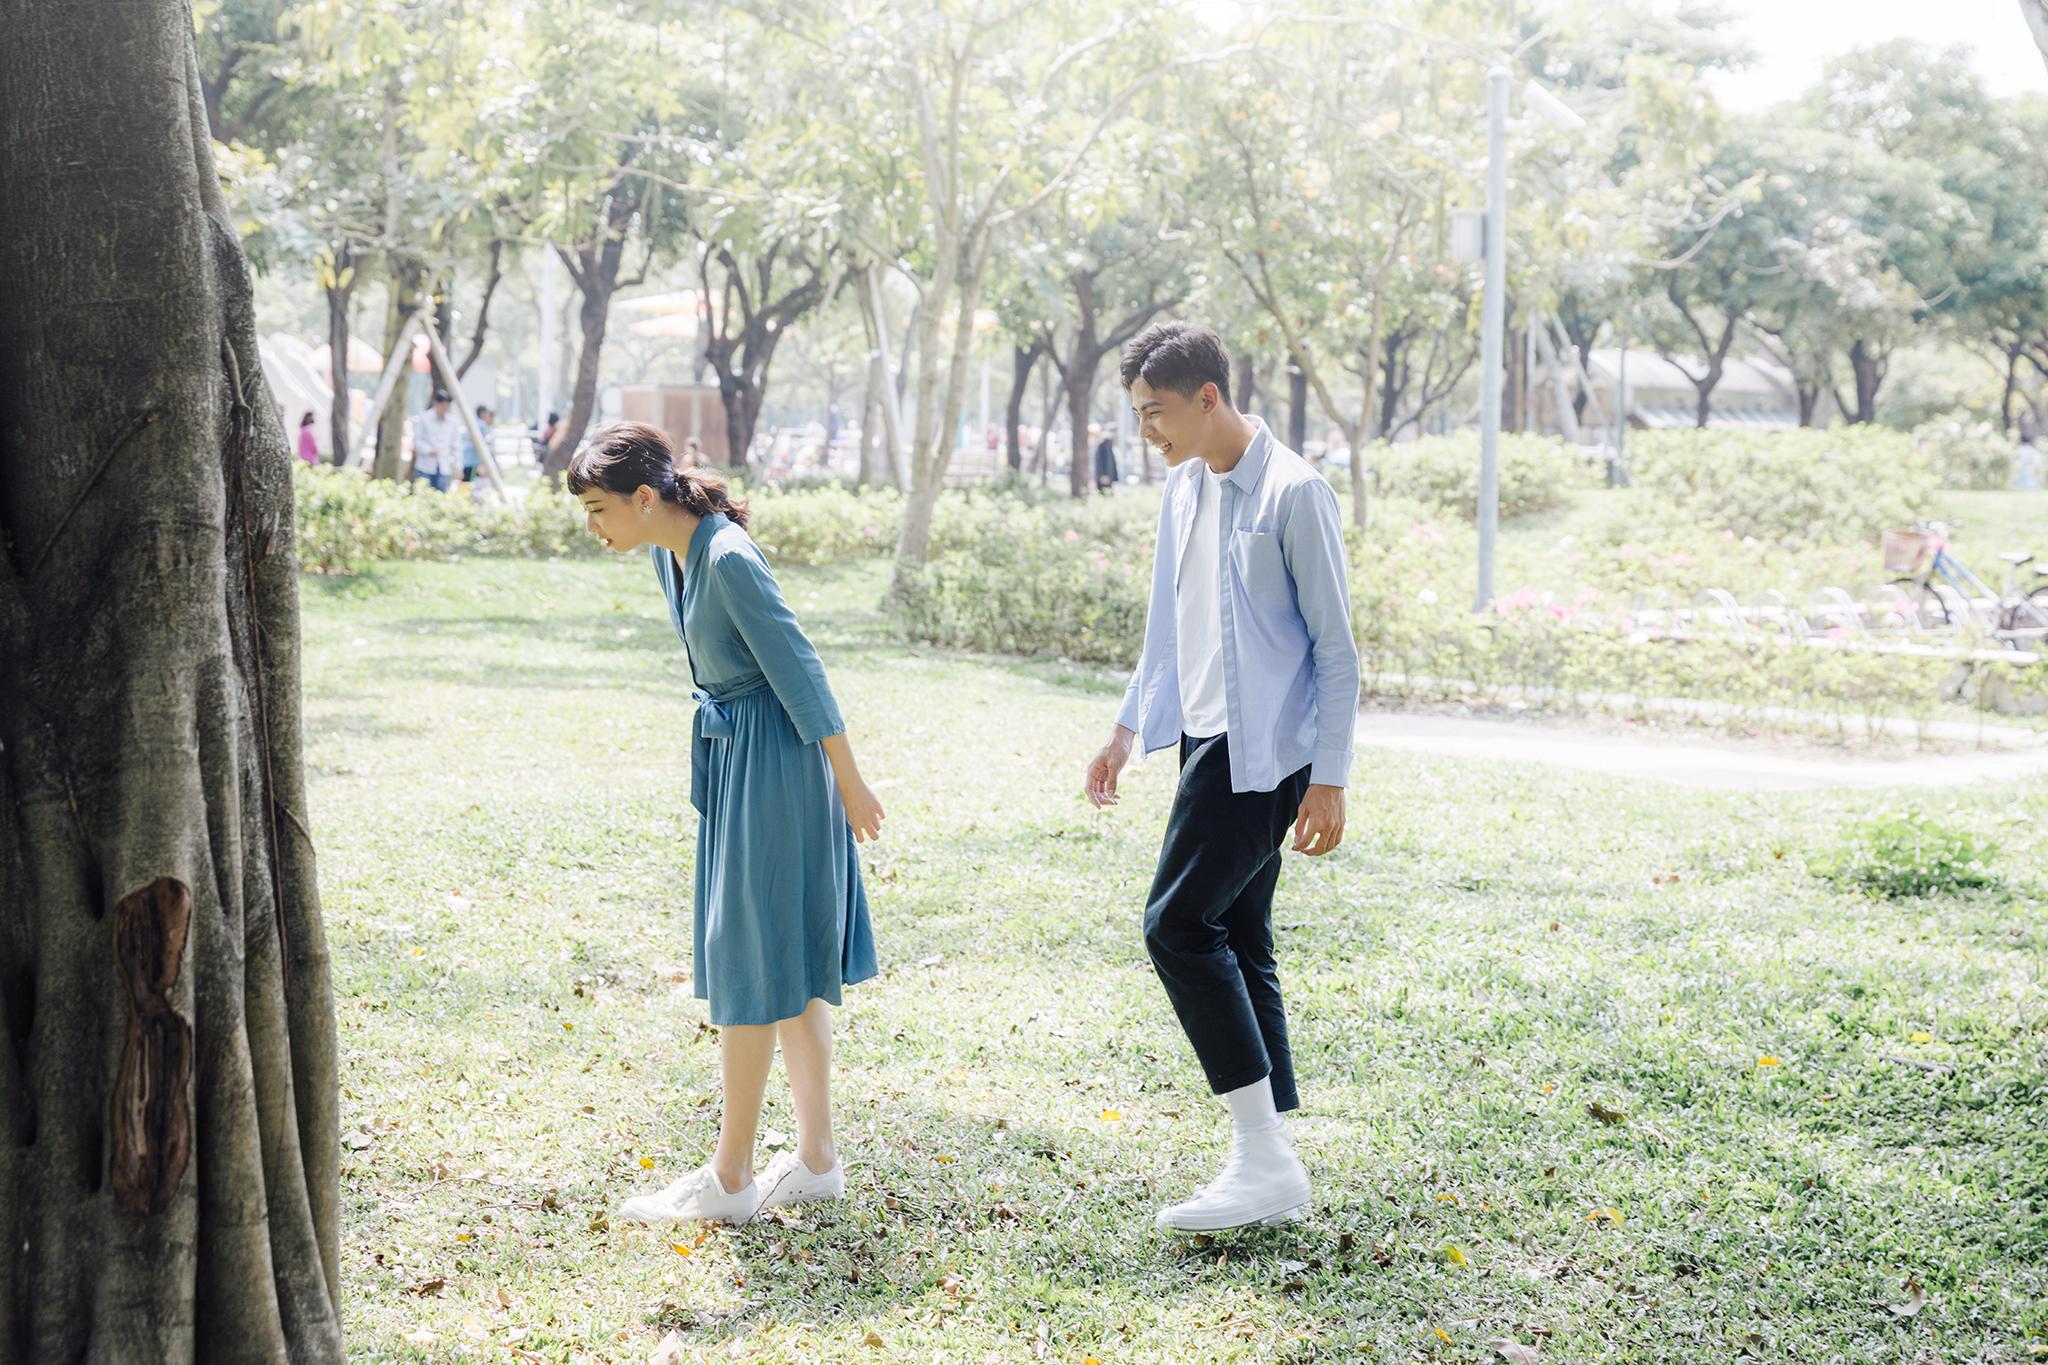 49818358707 0346f31d78 o - 【自助婚紗】+允宥&珮嘉+